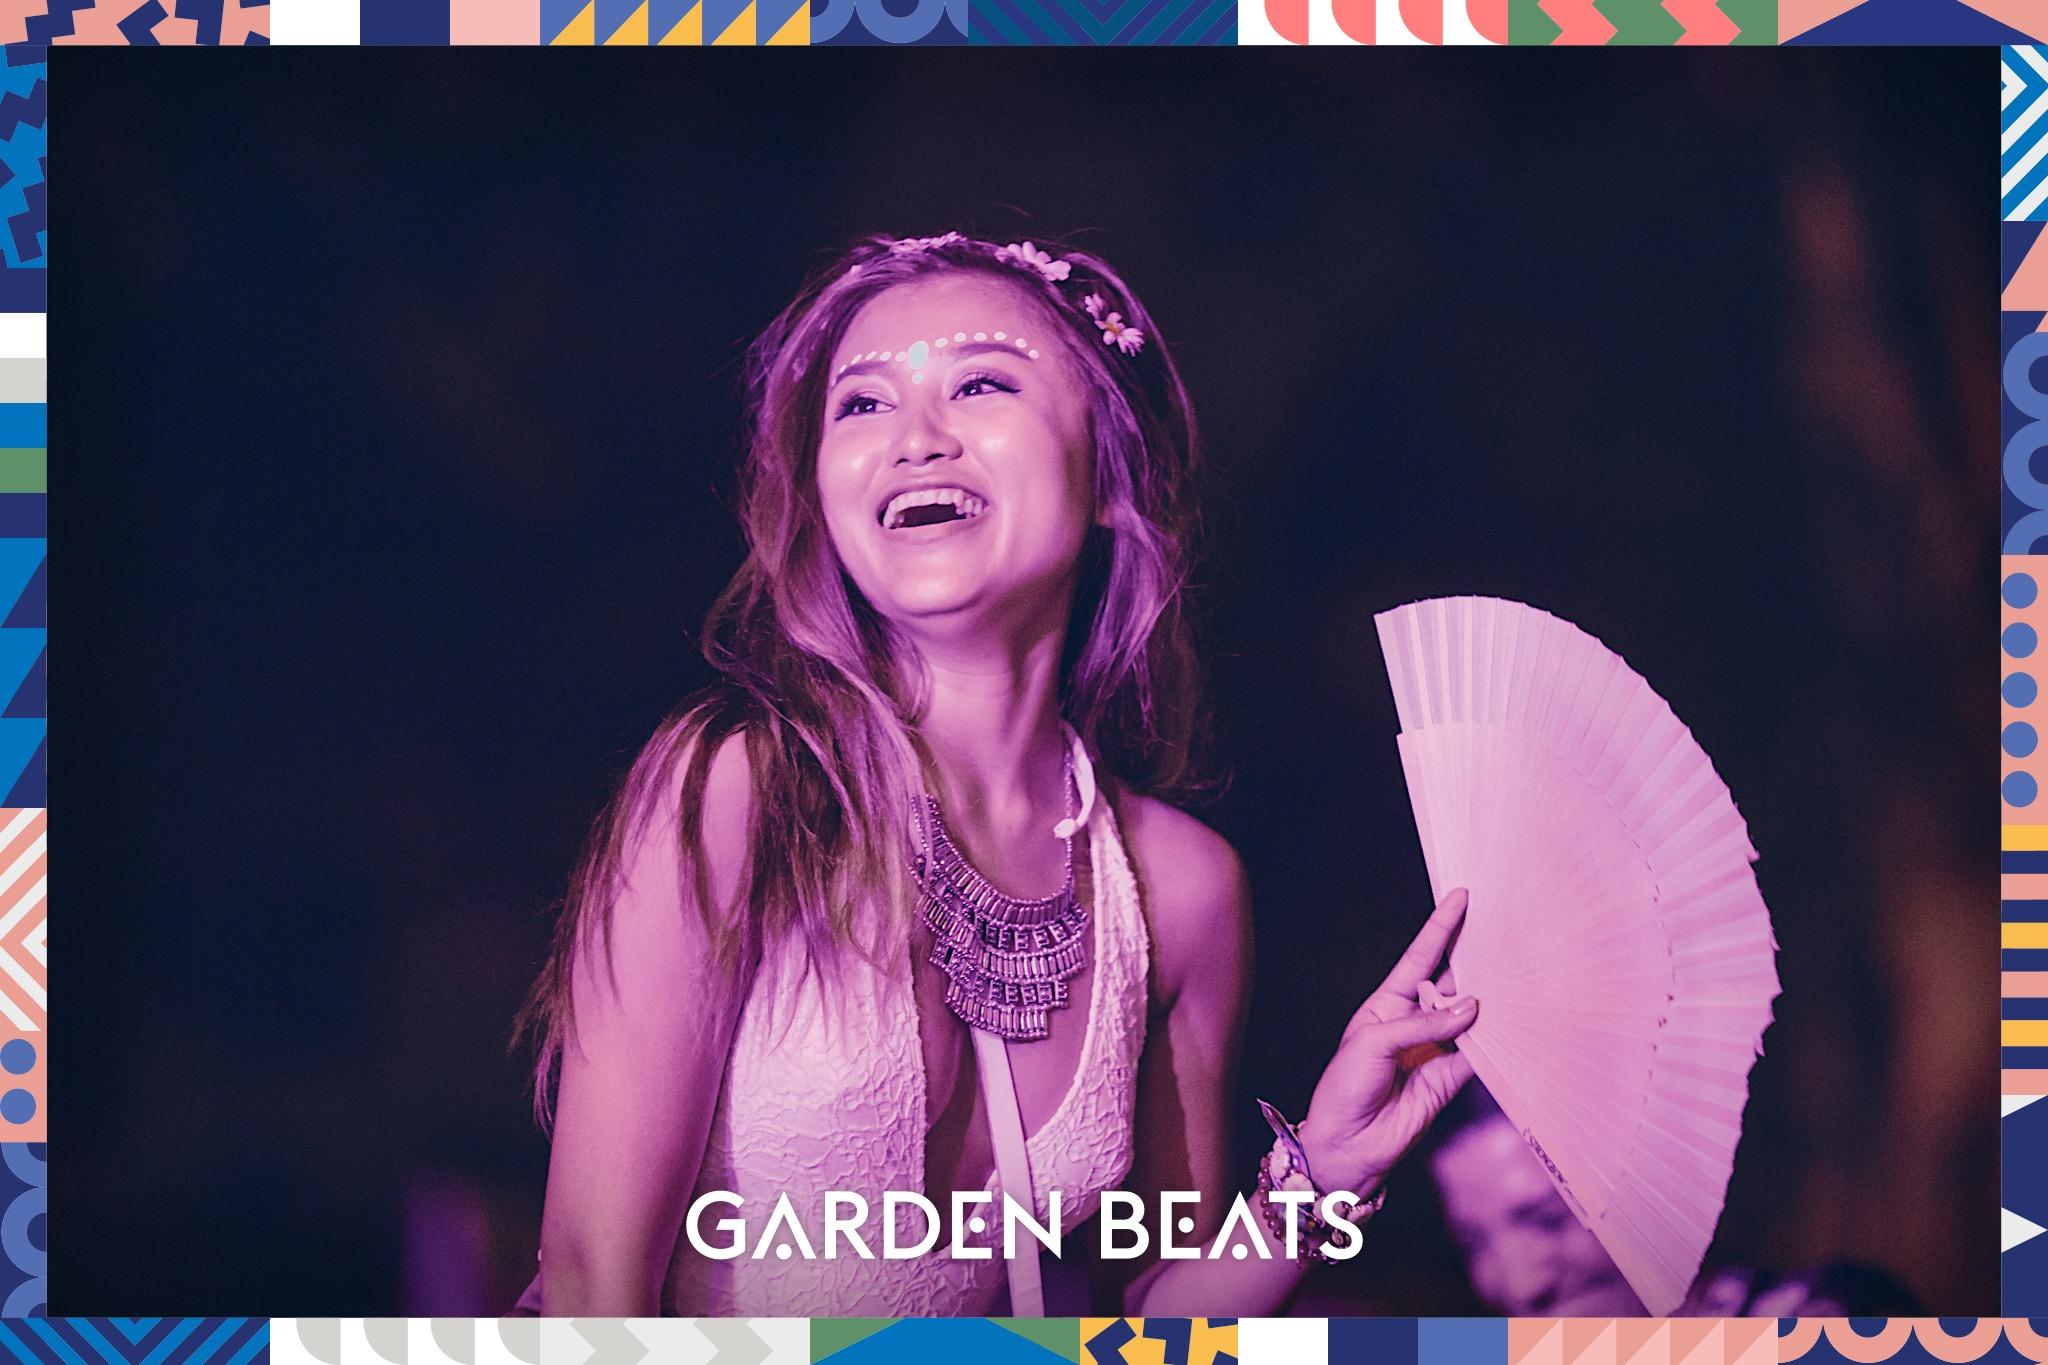 18032017_GardenBeats_Colossal795_WatermarkedGB.jpg